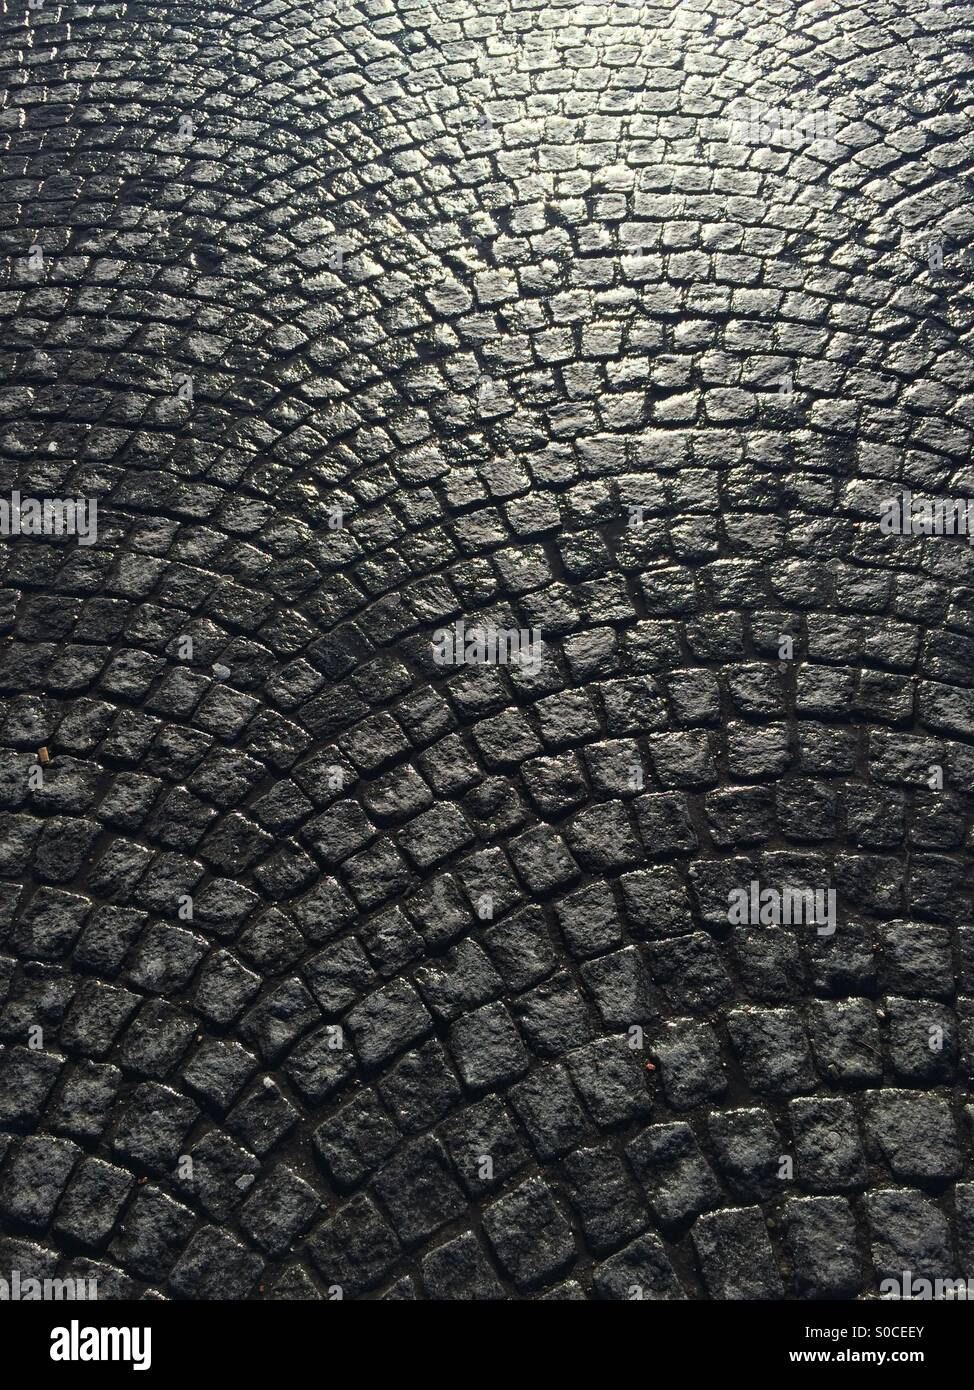 Cobblestone pavement after the rain has gone - Stock Image